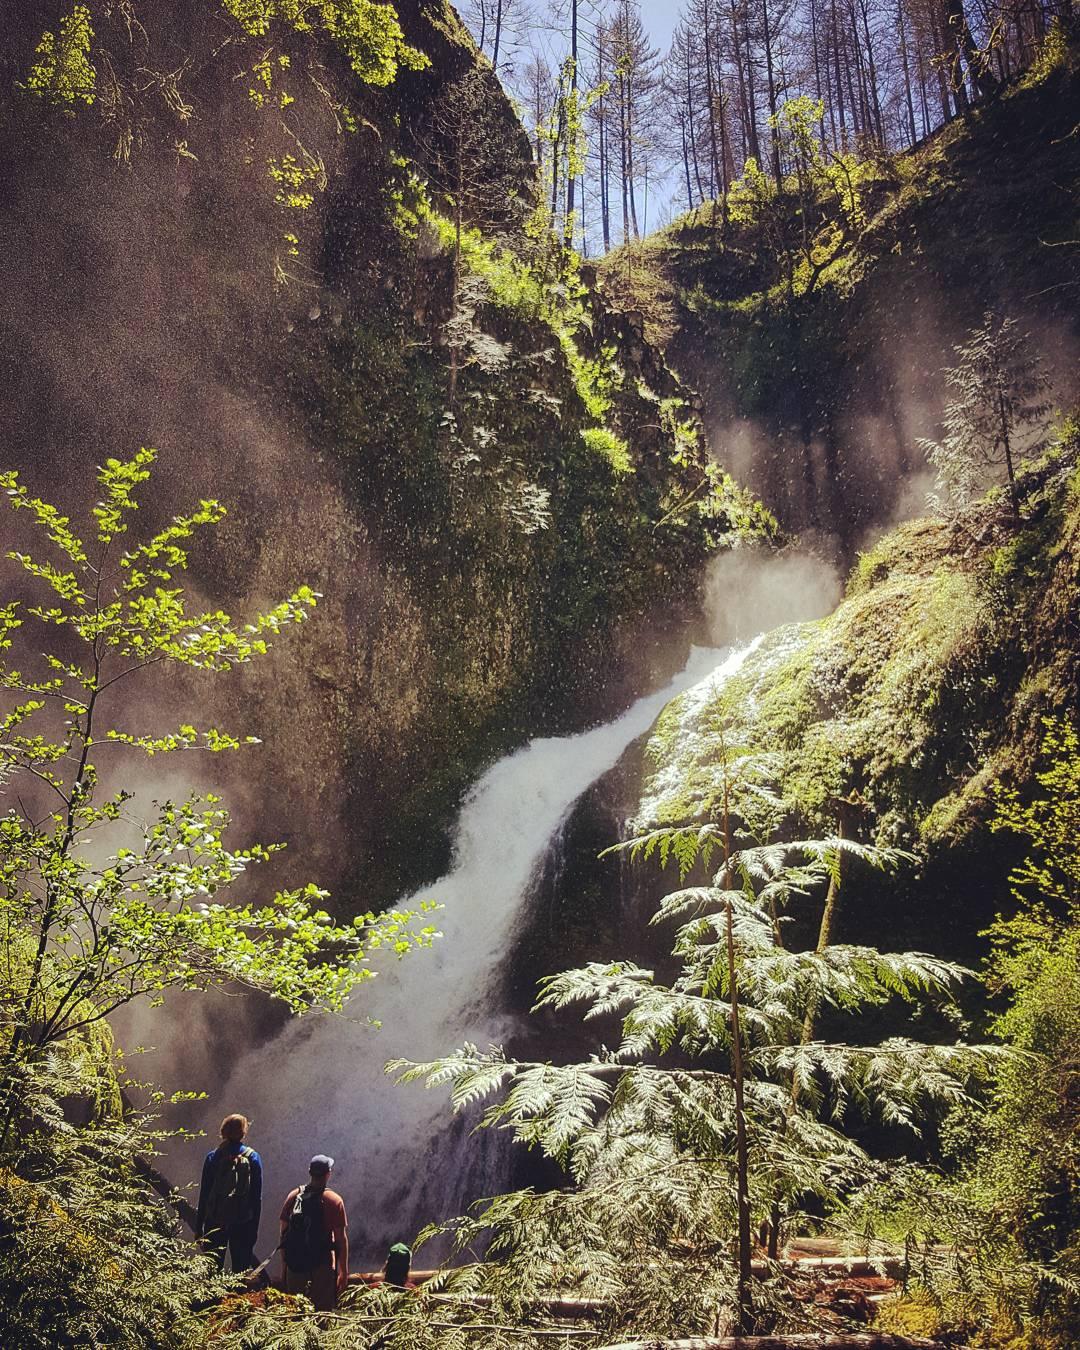 Wasim Muklashy Photography_Wasim of Nazareth Photography_Pacific Northwest_Oregon Washington_Months 1-3 Highlights_008.jpg